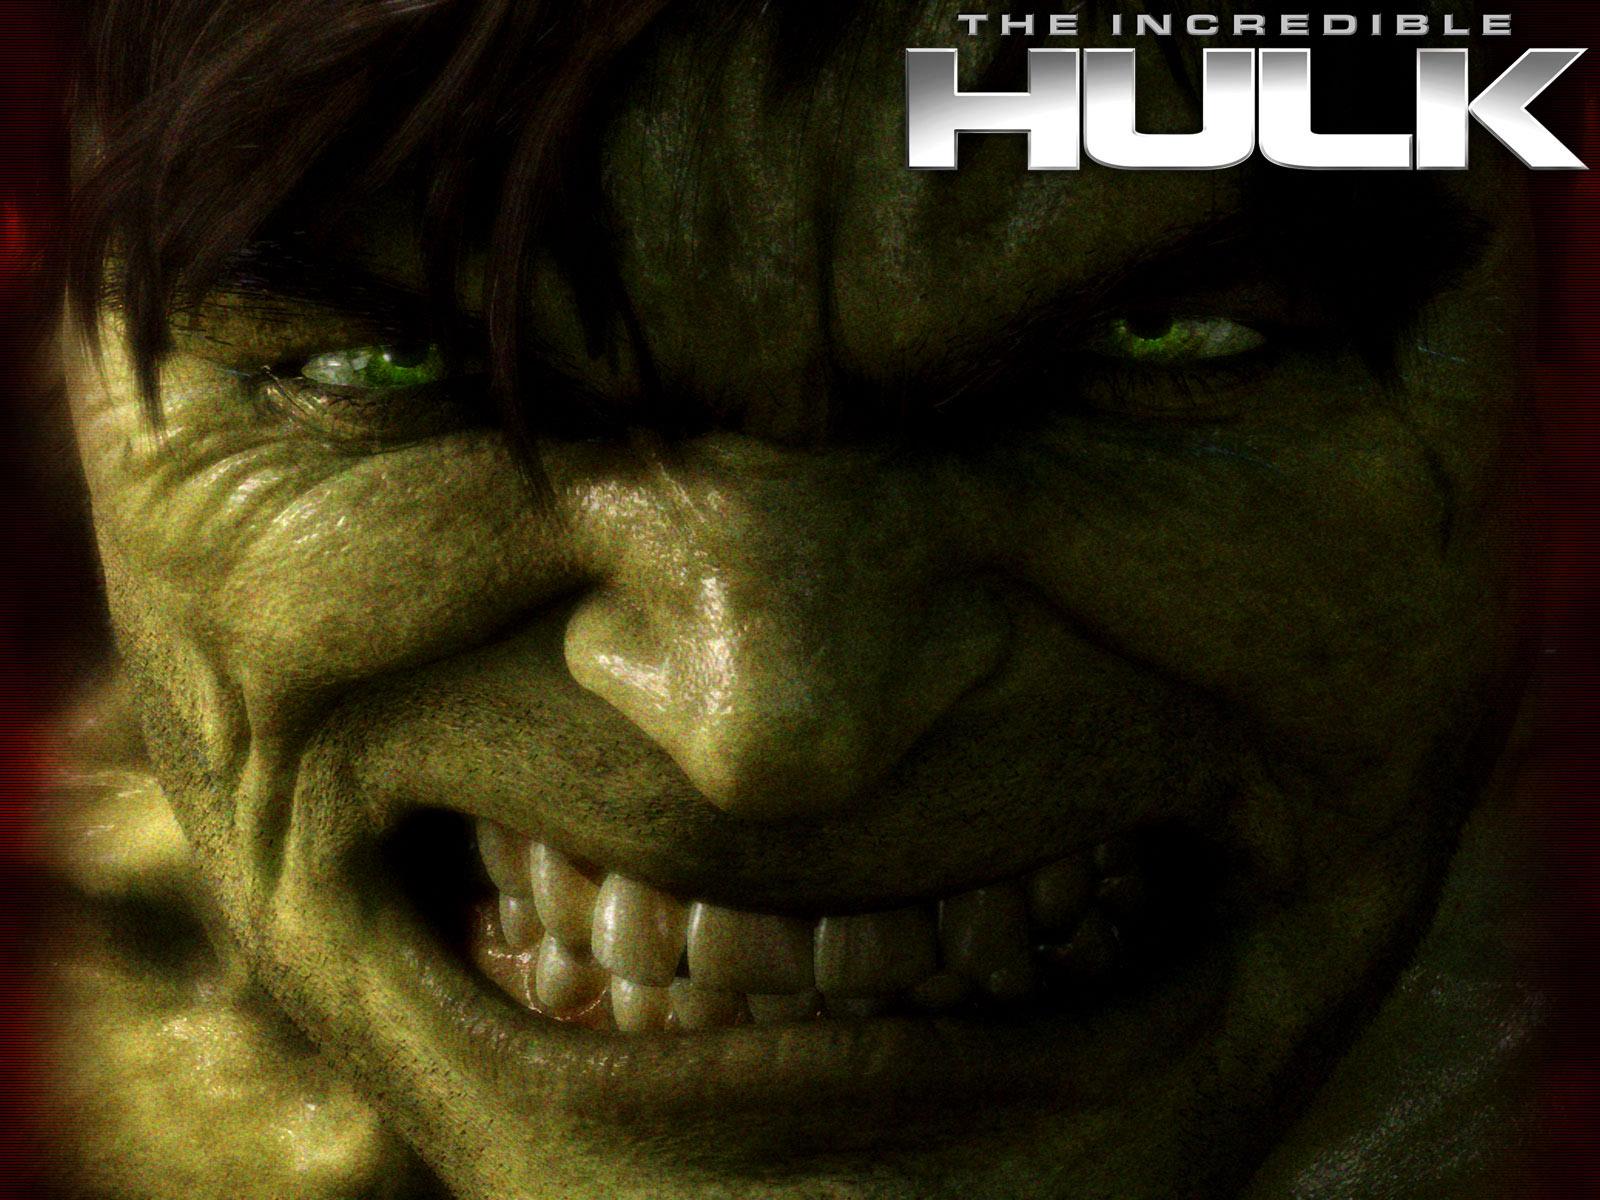 film the incredible hulk wallpaper groene hulk wallpaper strip figuur 1600x1200